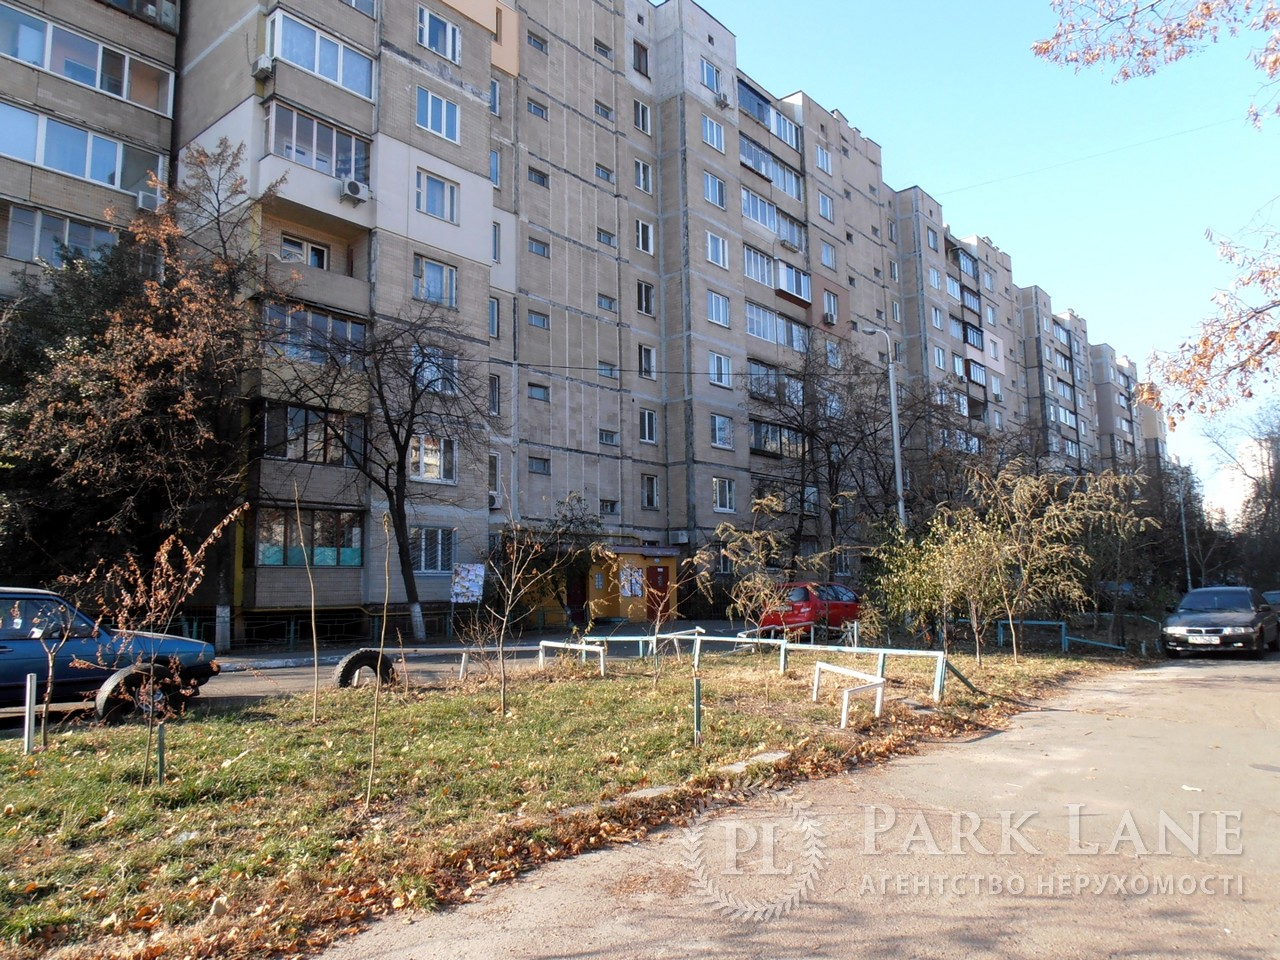 Квартира Z-1844893, Лифаря Сержа (Сабурова Александра), 17, Киев - Фото 1